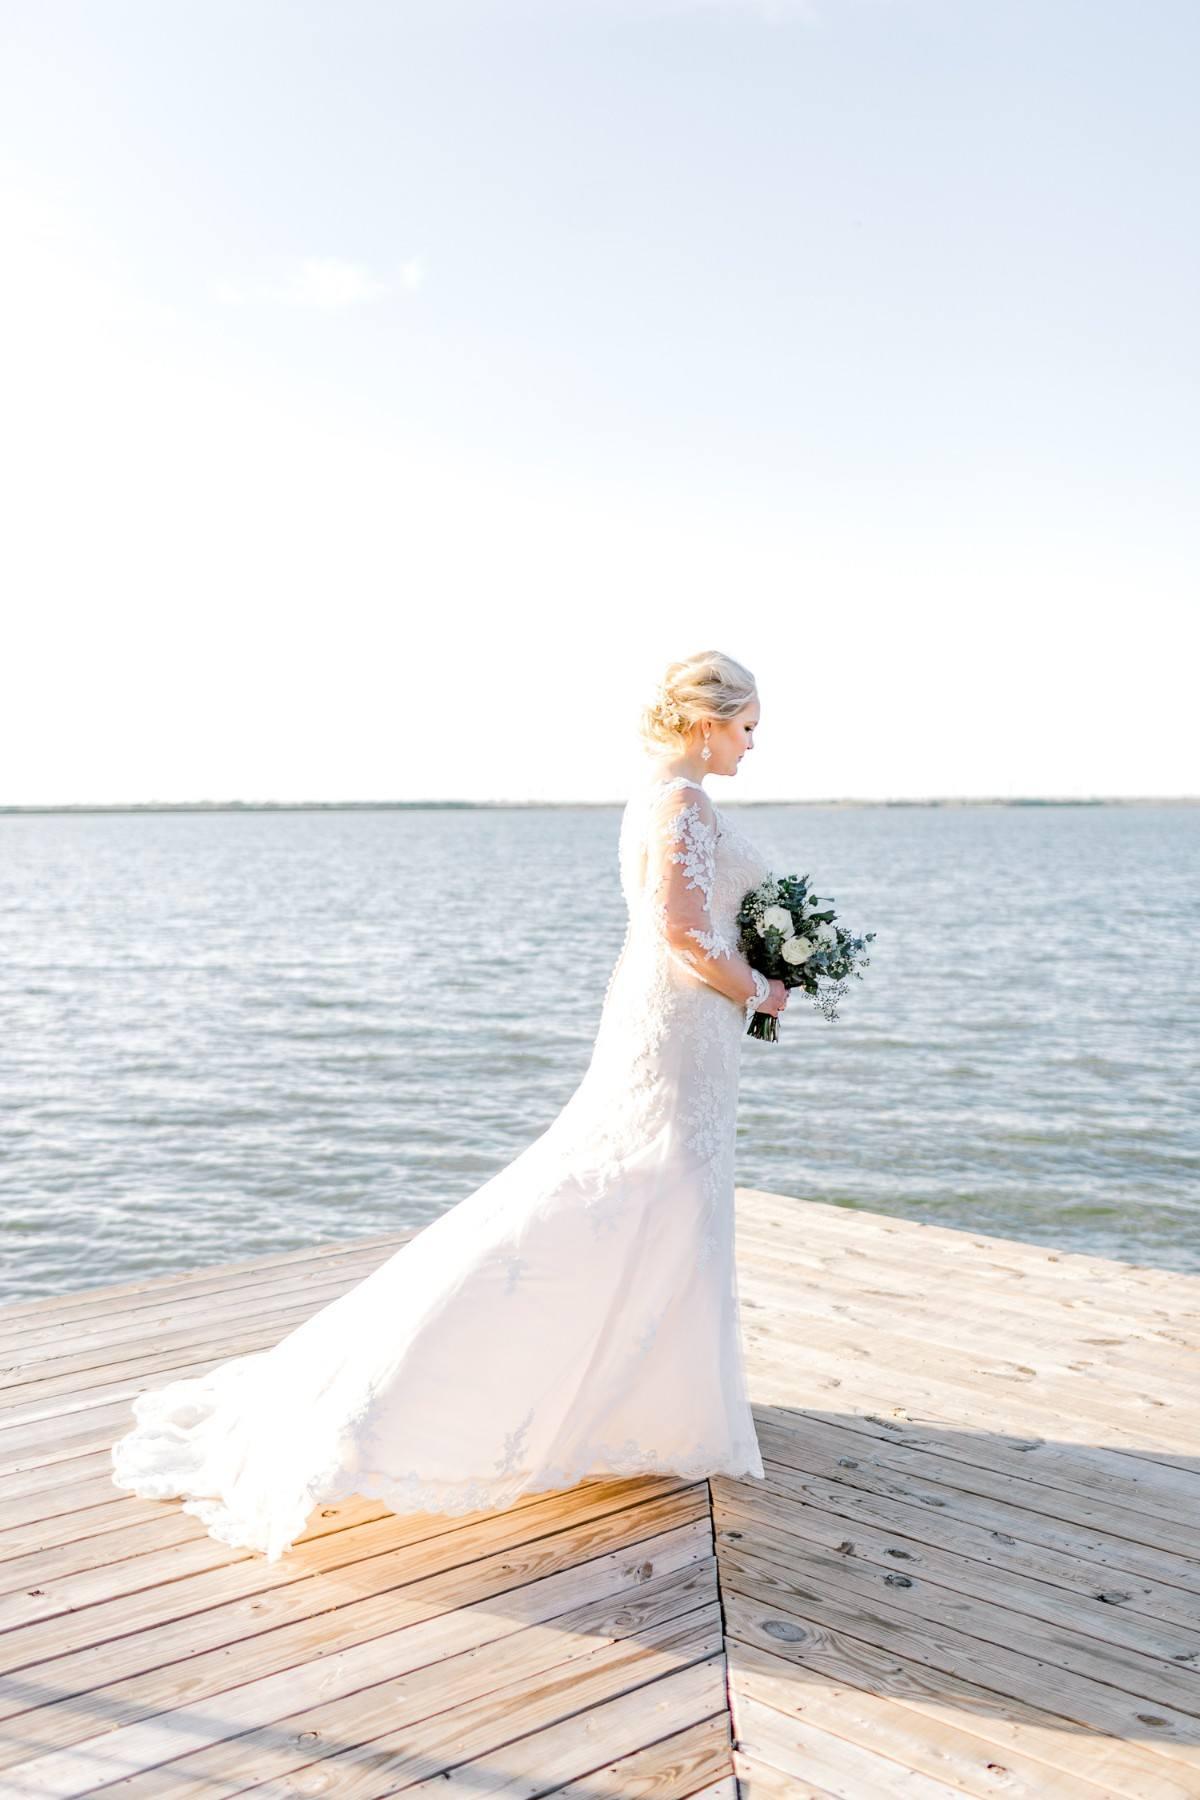 casidy-bridals-tradinghouse-lake-waco-wedding-photographer-kaitlyn-bullard-20.jpg